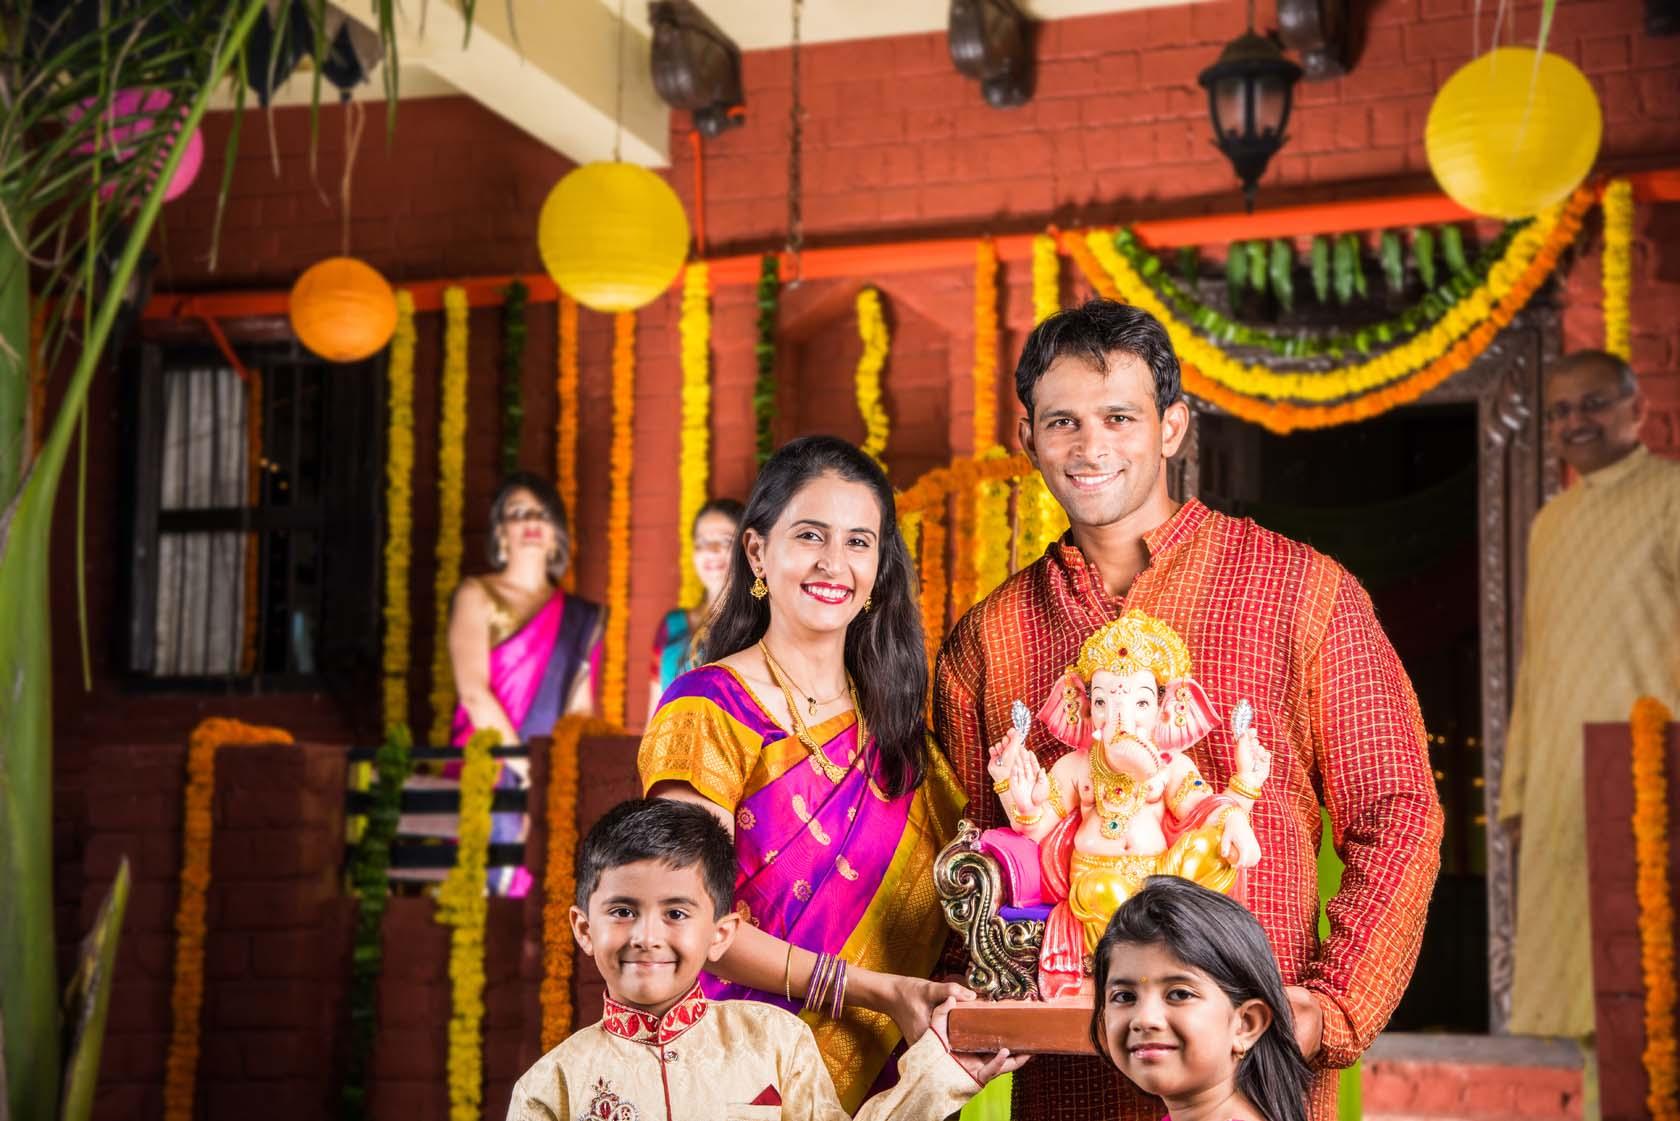 Welcoming Lord Ganesh